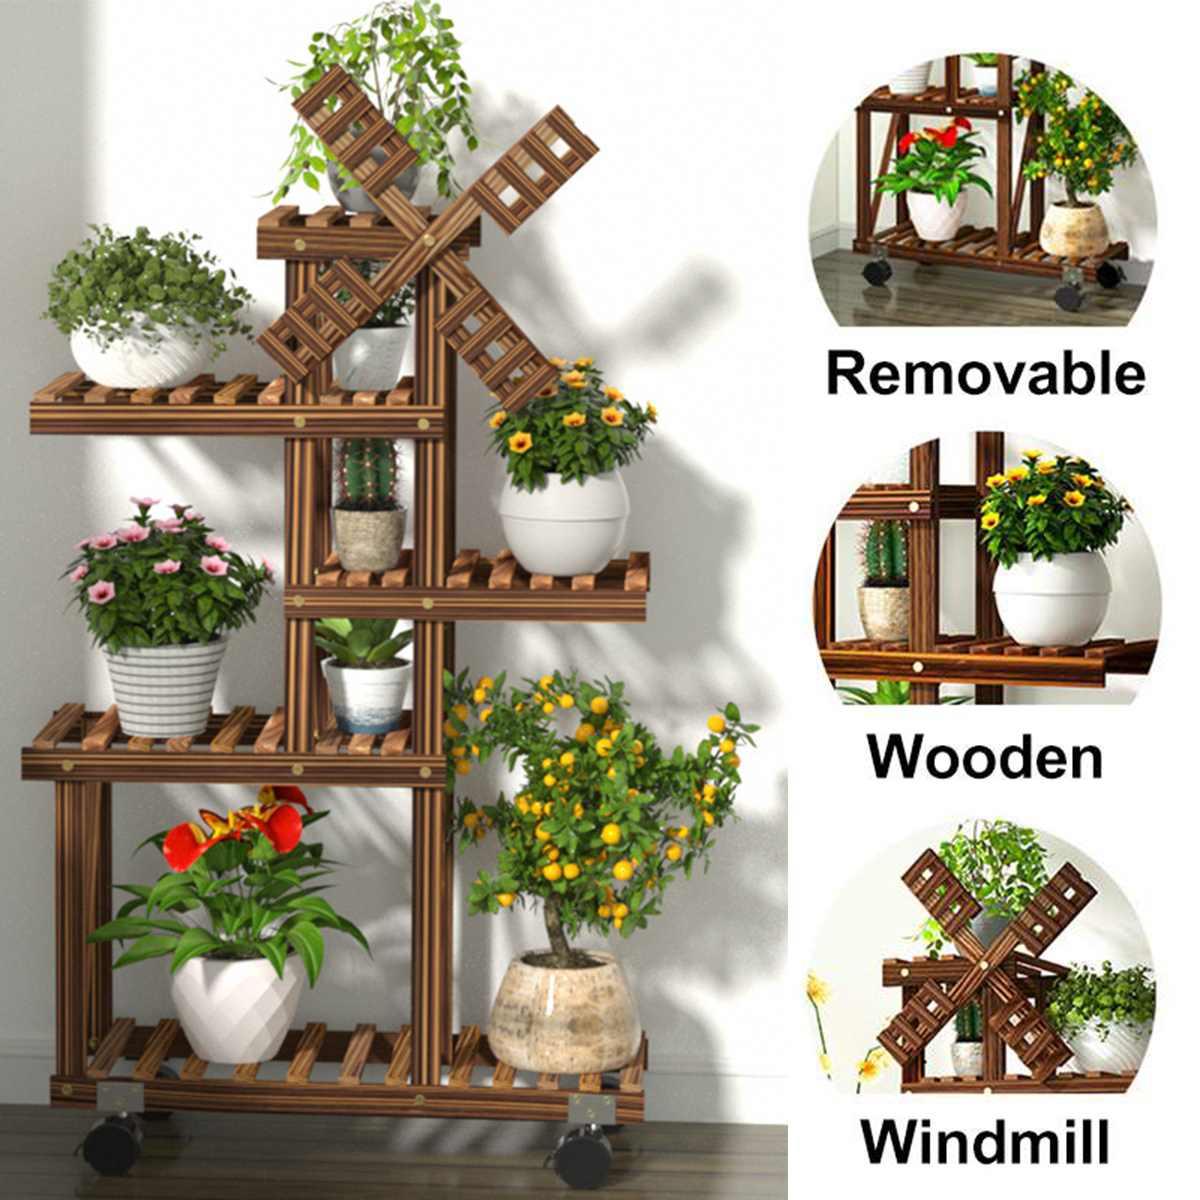 5 Tiers Wooden Flower Stand Rack Plant Stand Flower Plant Shelves Bonsai Display Shelf Yard Garden Ourdoor Balcony Decor